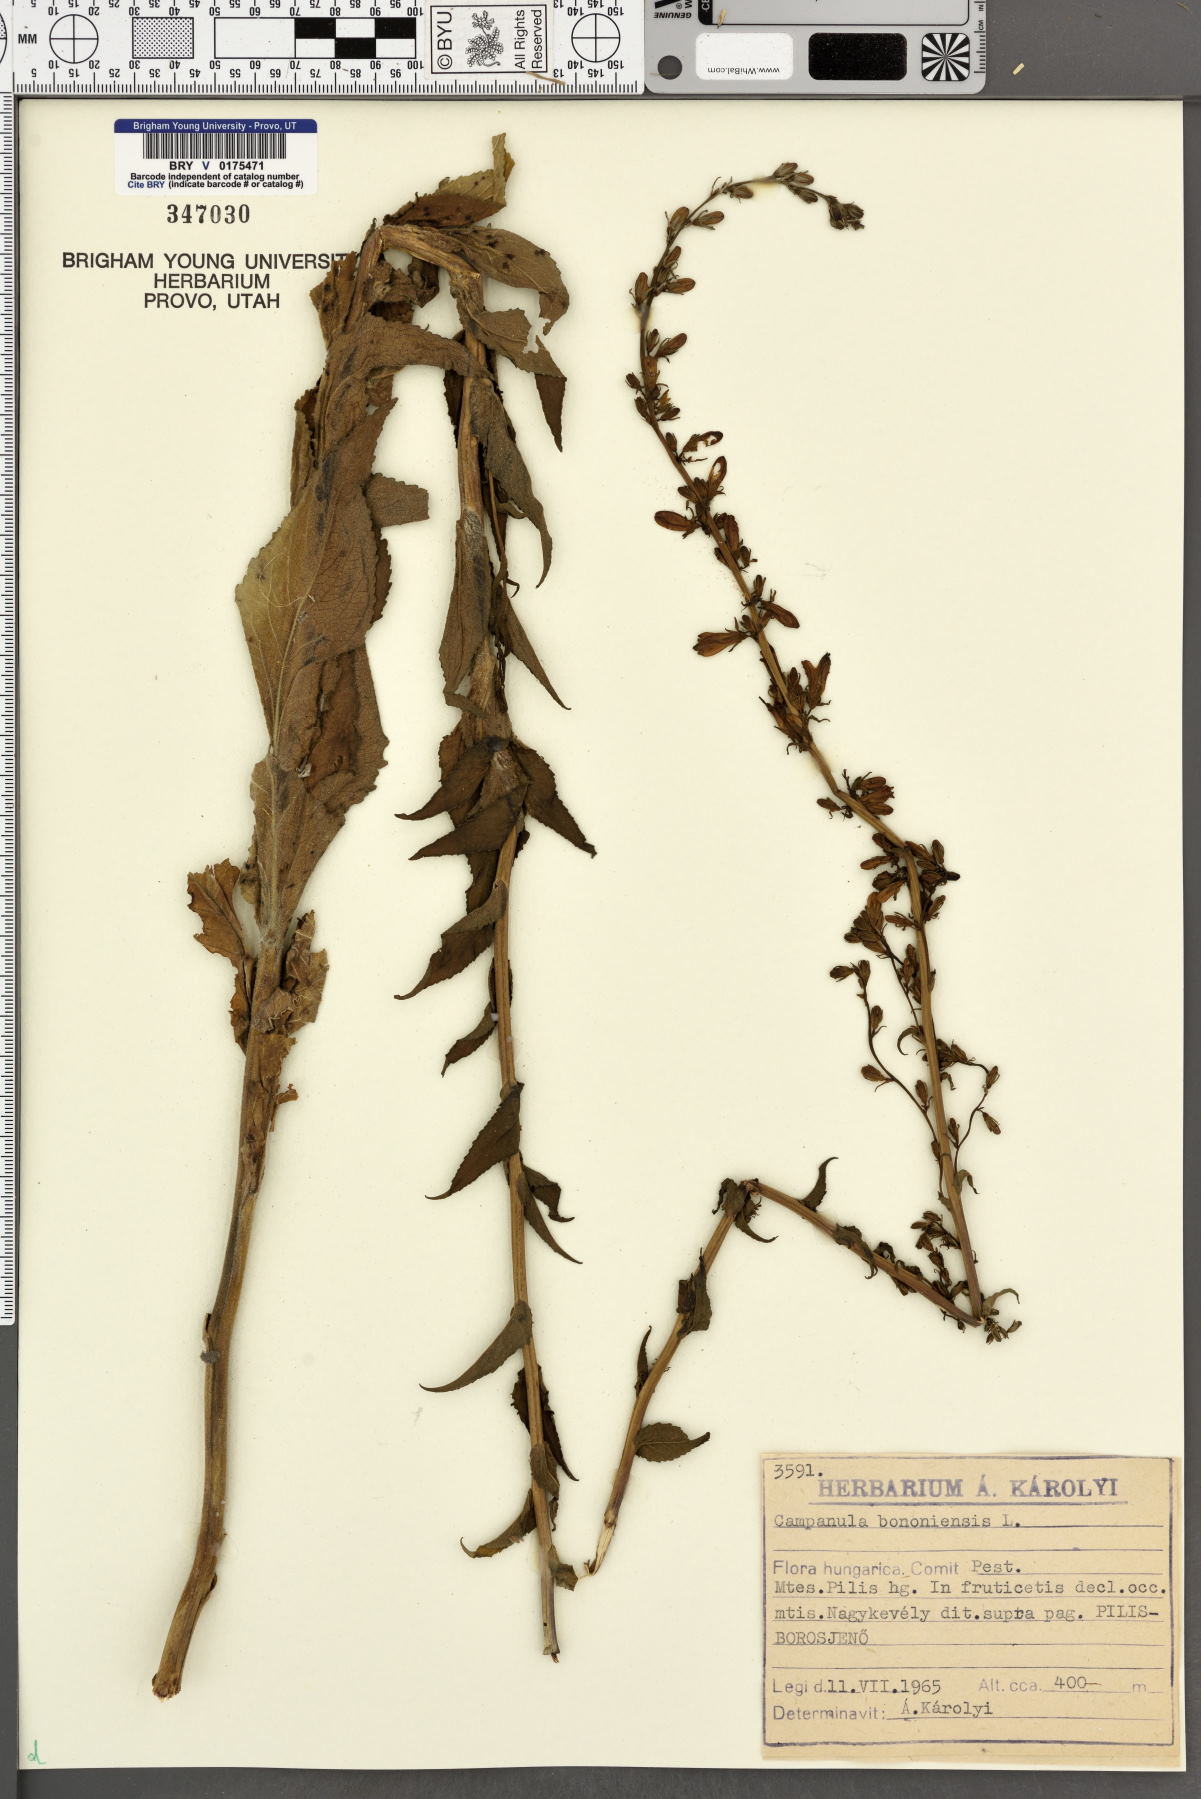 Campanula bononiensis image